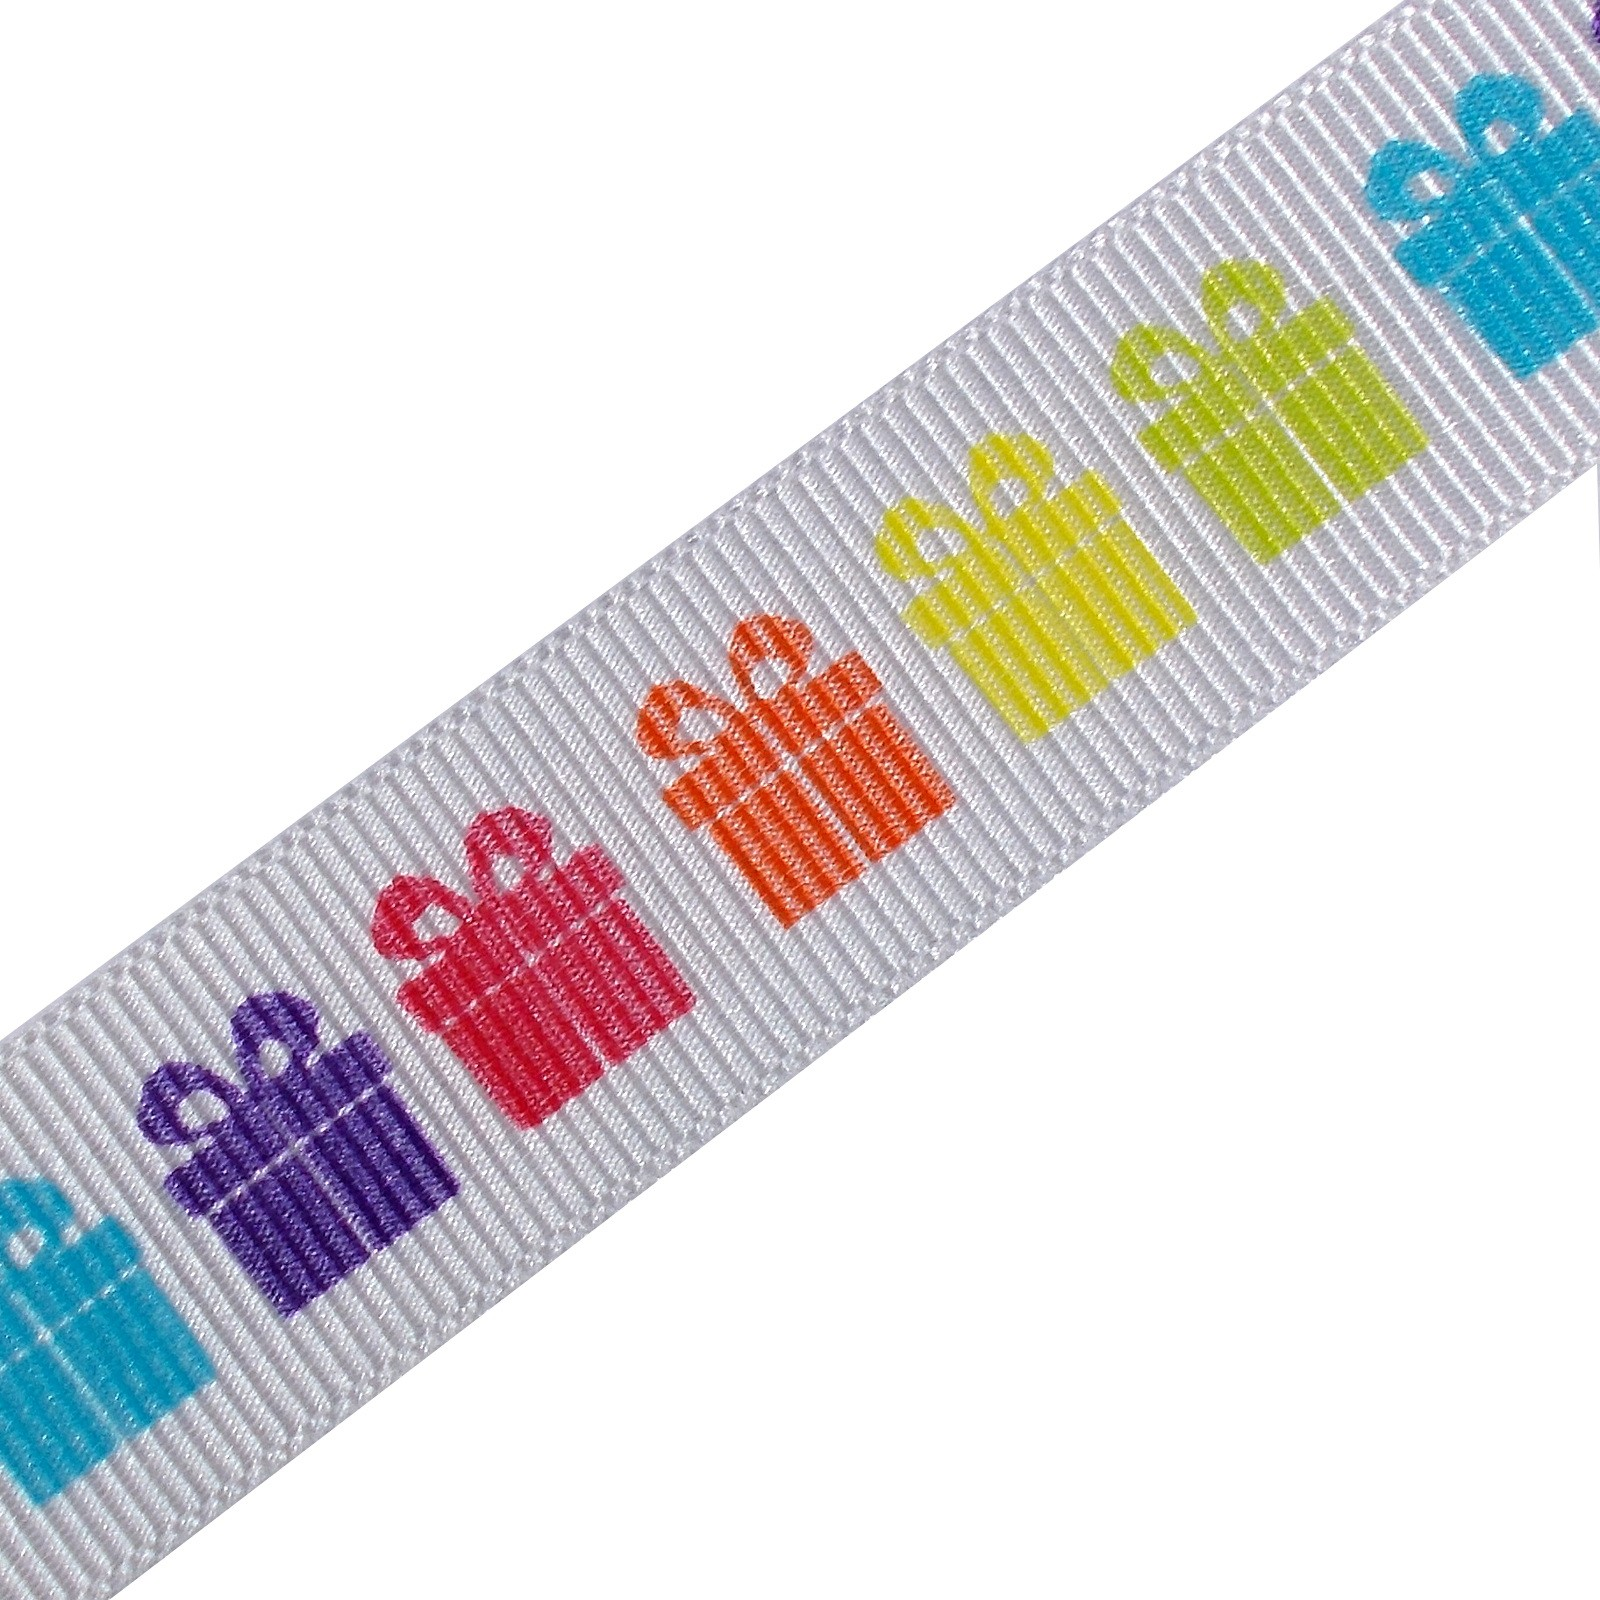 Berisfords Bright Rainbow Grosgrain Ribbon 16mm wide Parcel Gifts 2 metre length